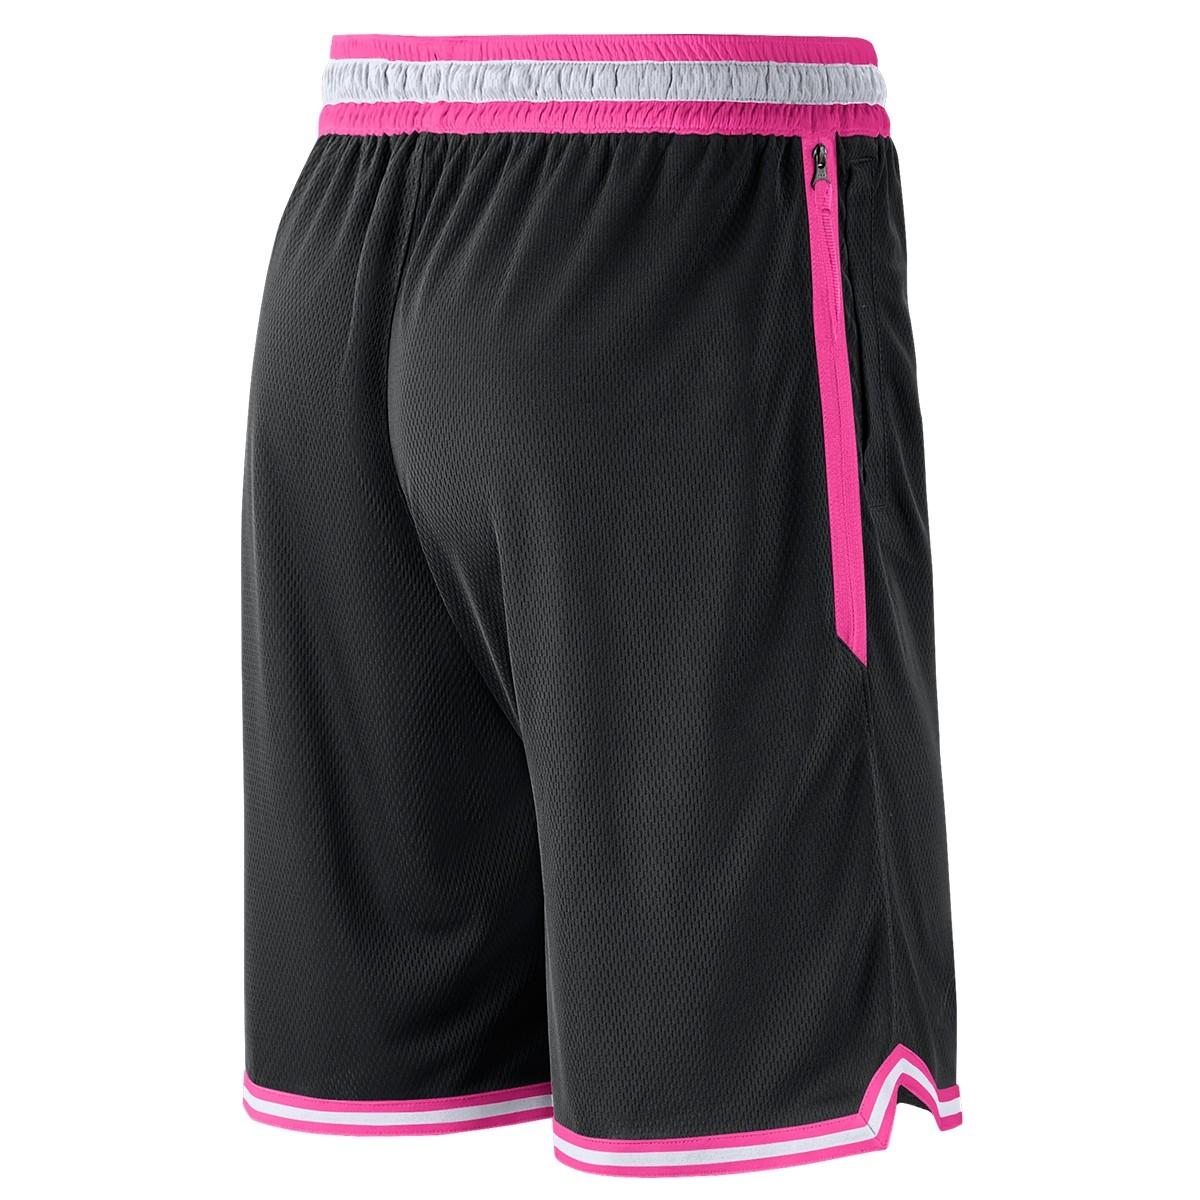 Nike Short Team 31 DNA 'Black'-CN9700-010